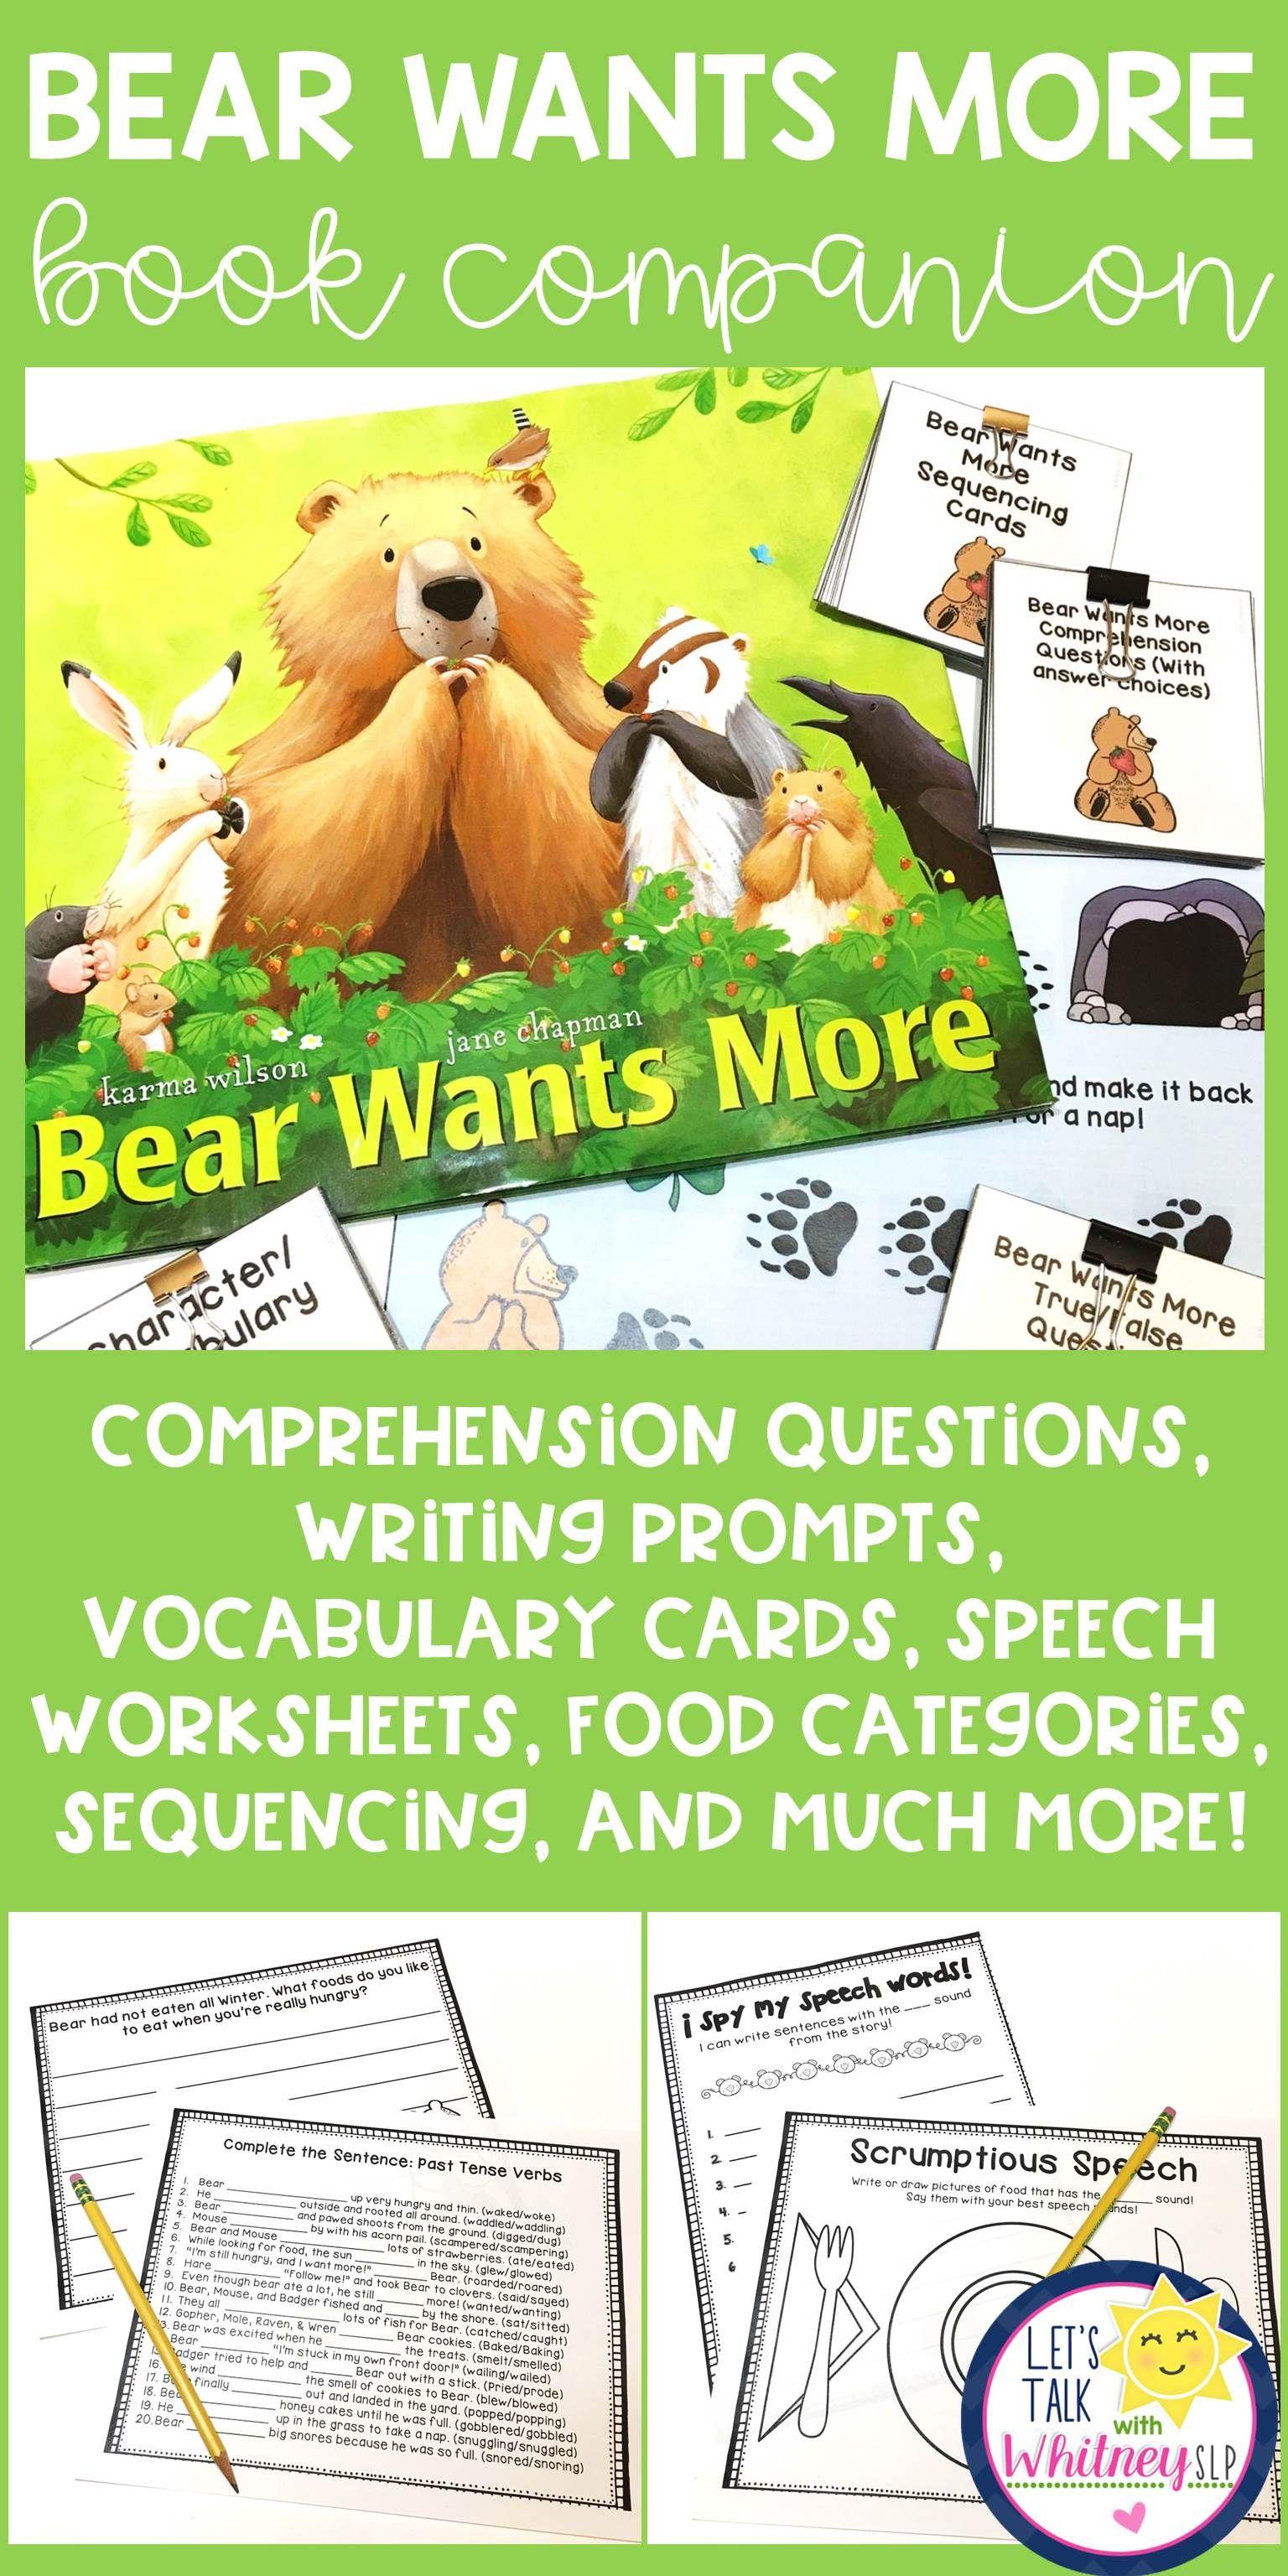 Bear Wants More Book Companion